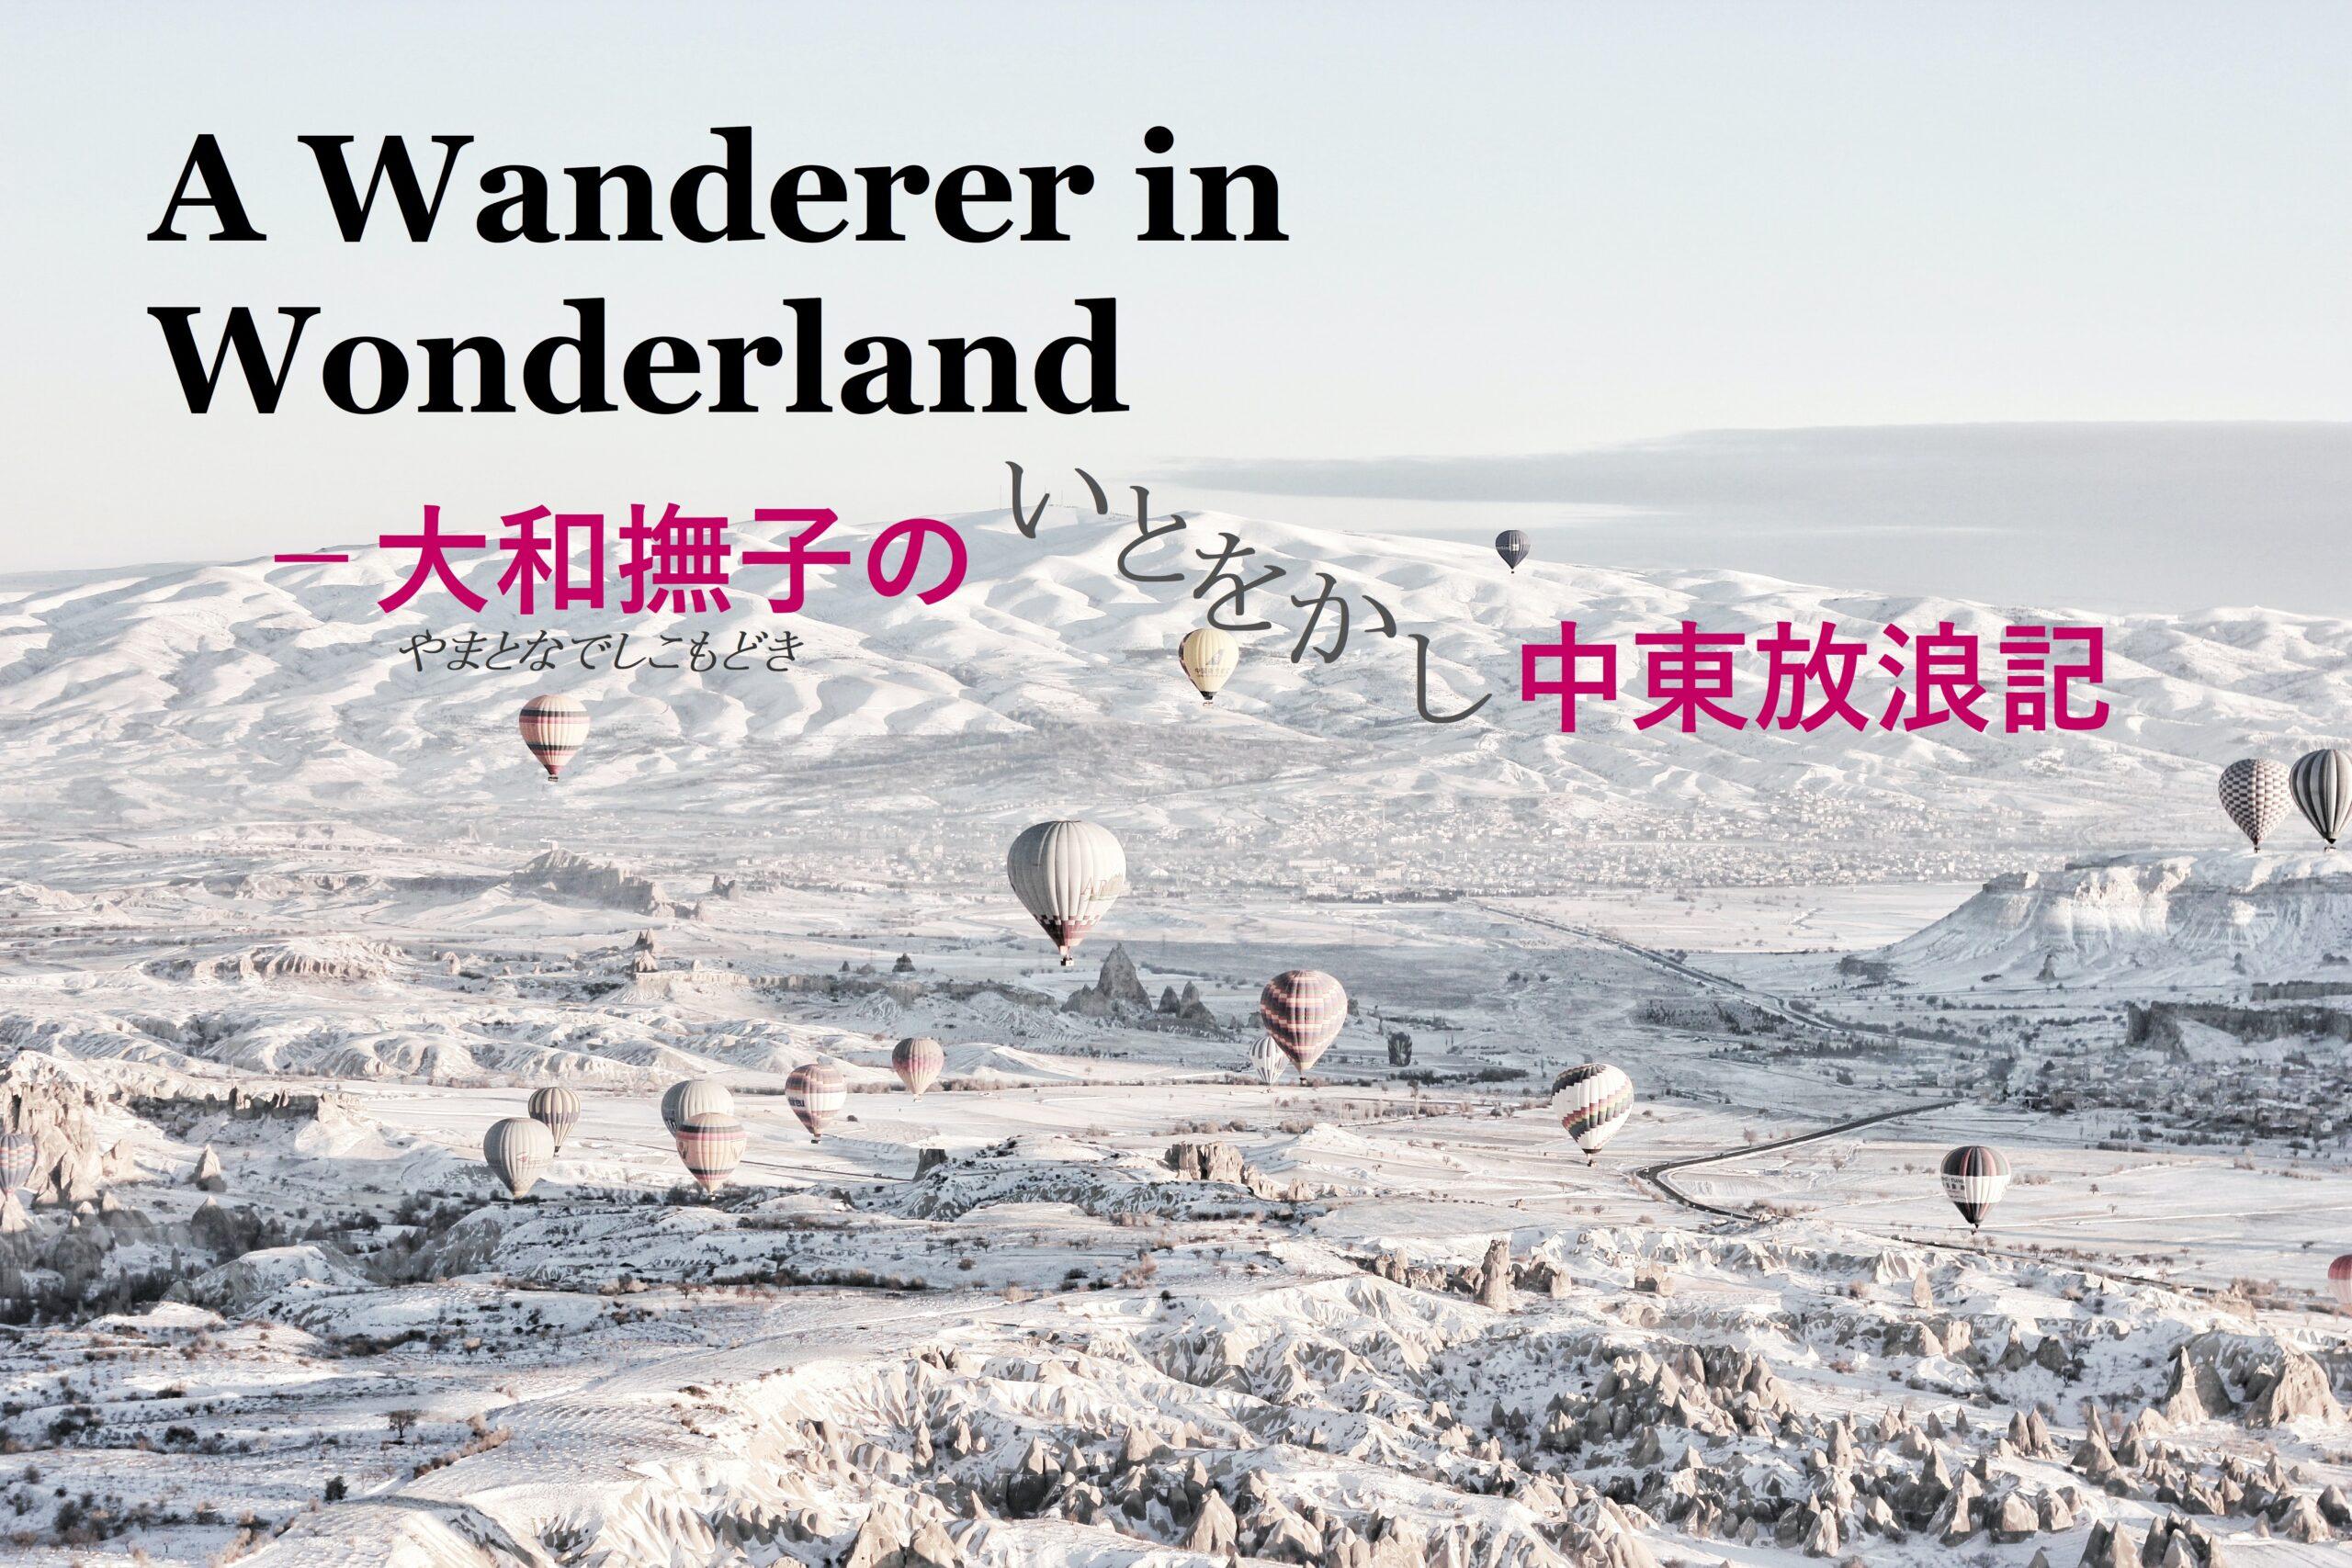 A Wanderer in Wonderland - 大和撫子の中東放浪記